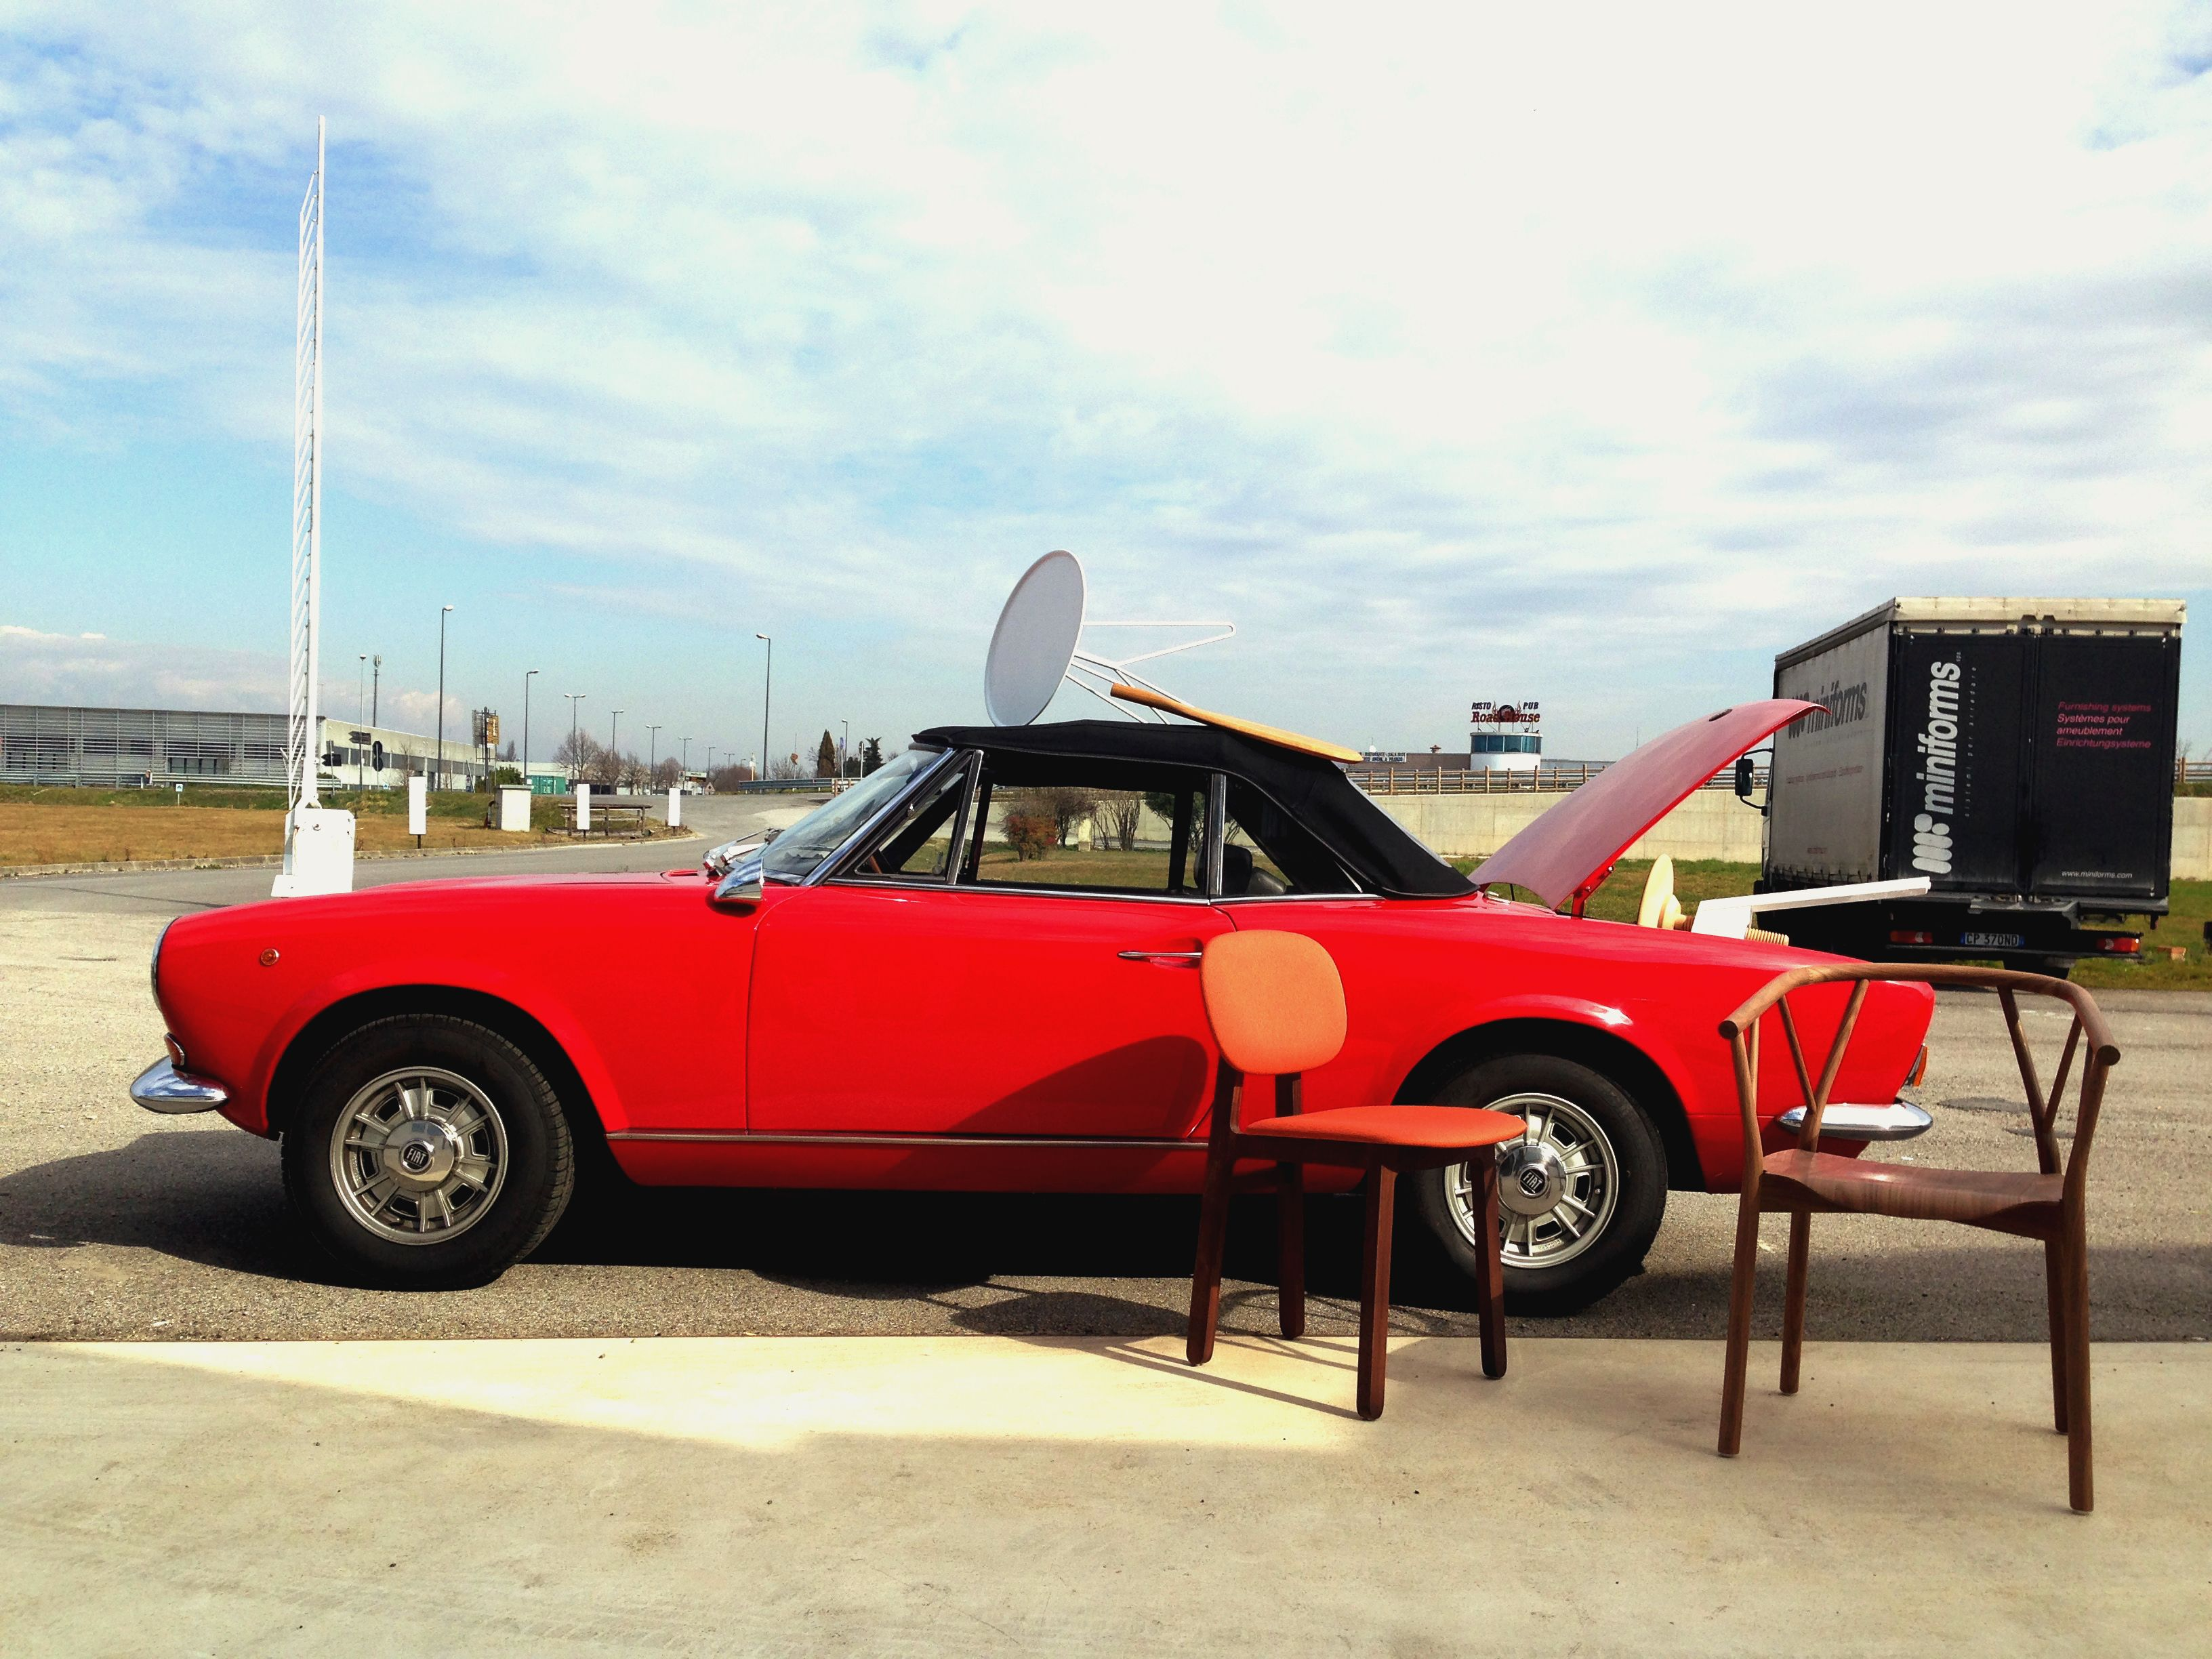 vintage style today! love this day. #miniforms #interiordesign #design #homedecor #car #sun #outside